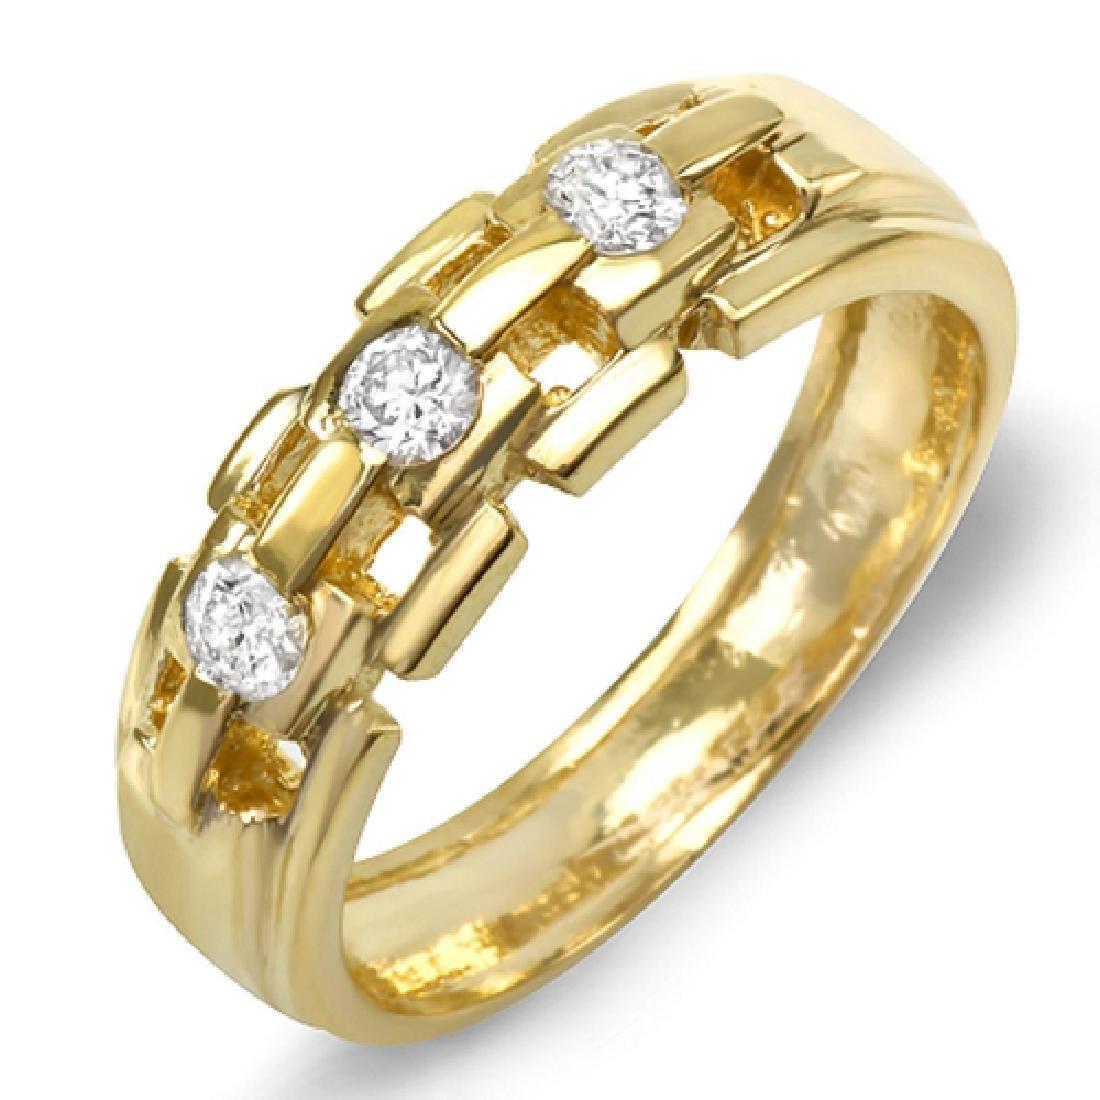 Mens 0.75 Carat Natural Diamond 18K Solid Yellow Gold - 2